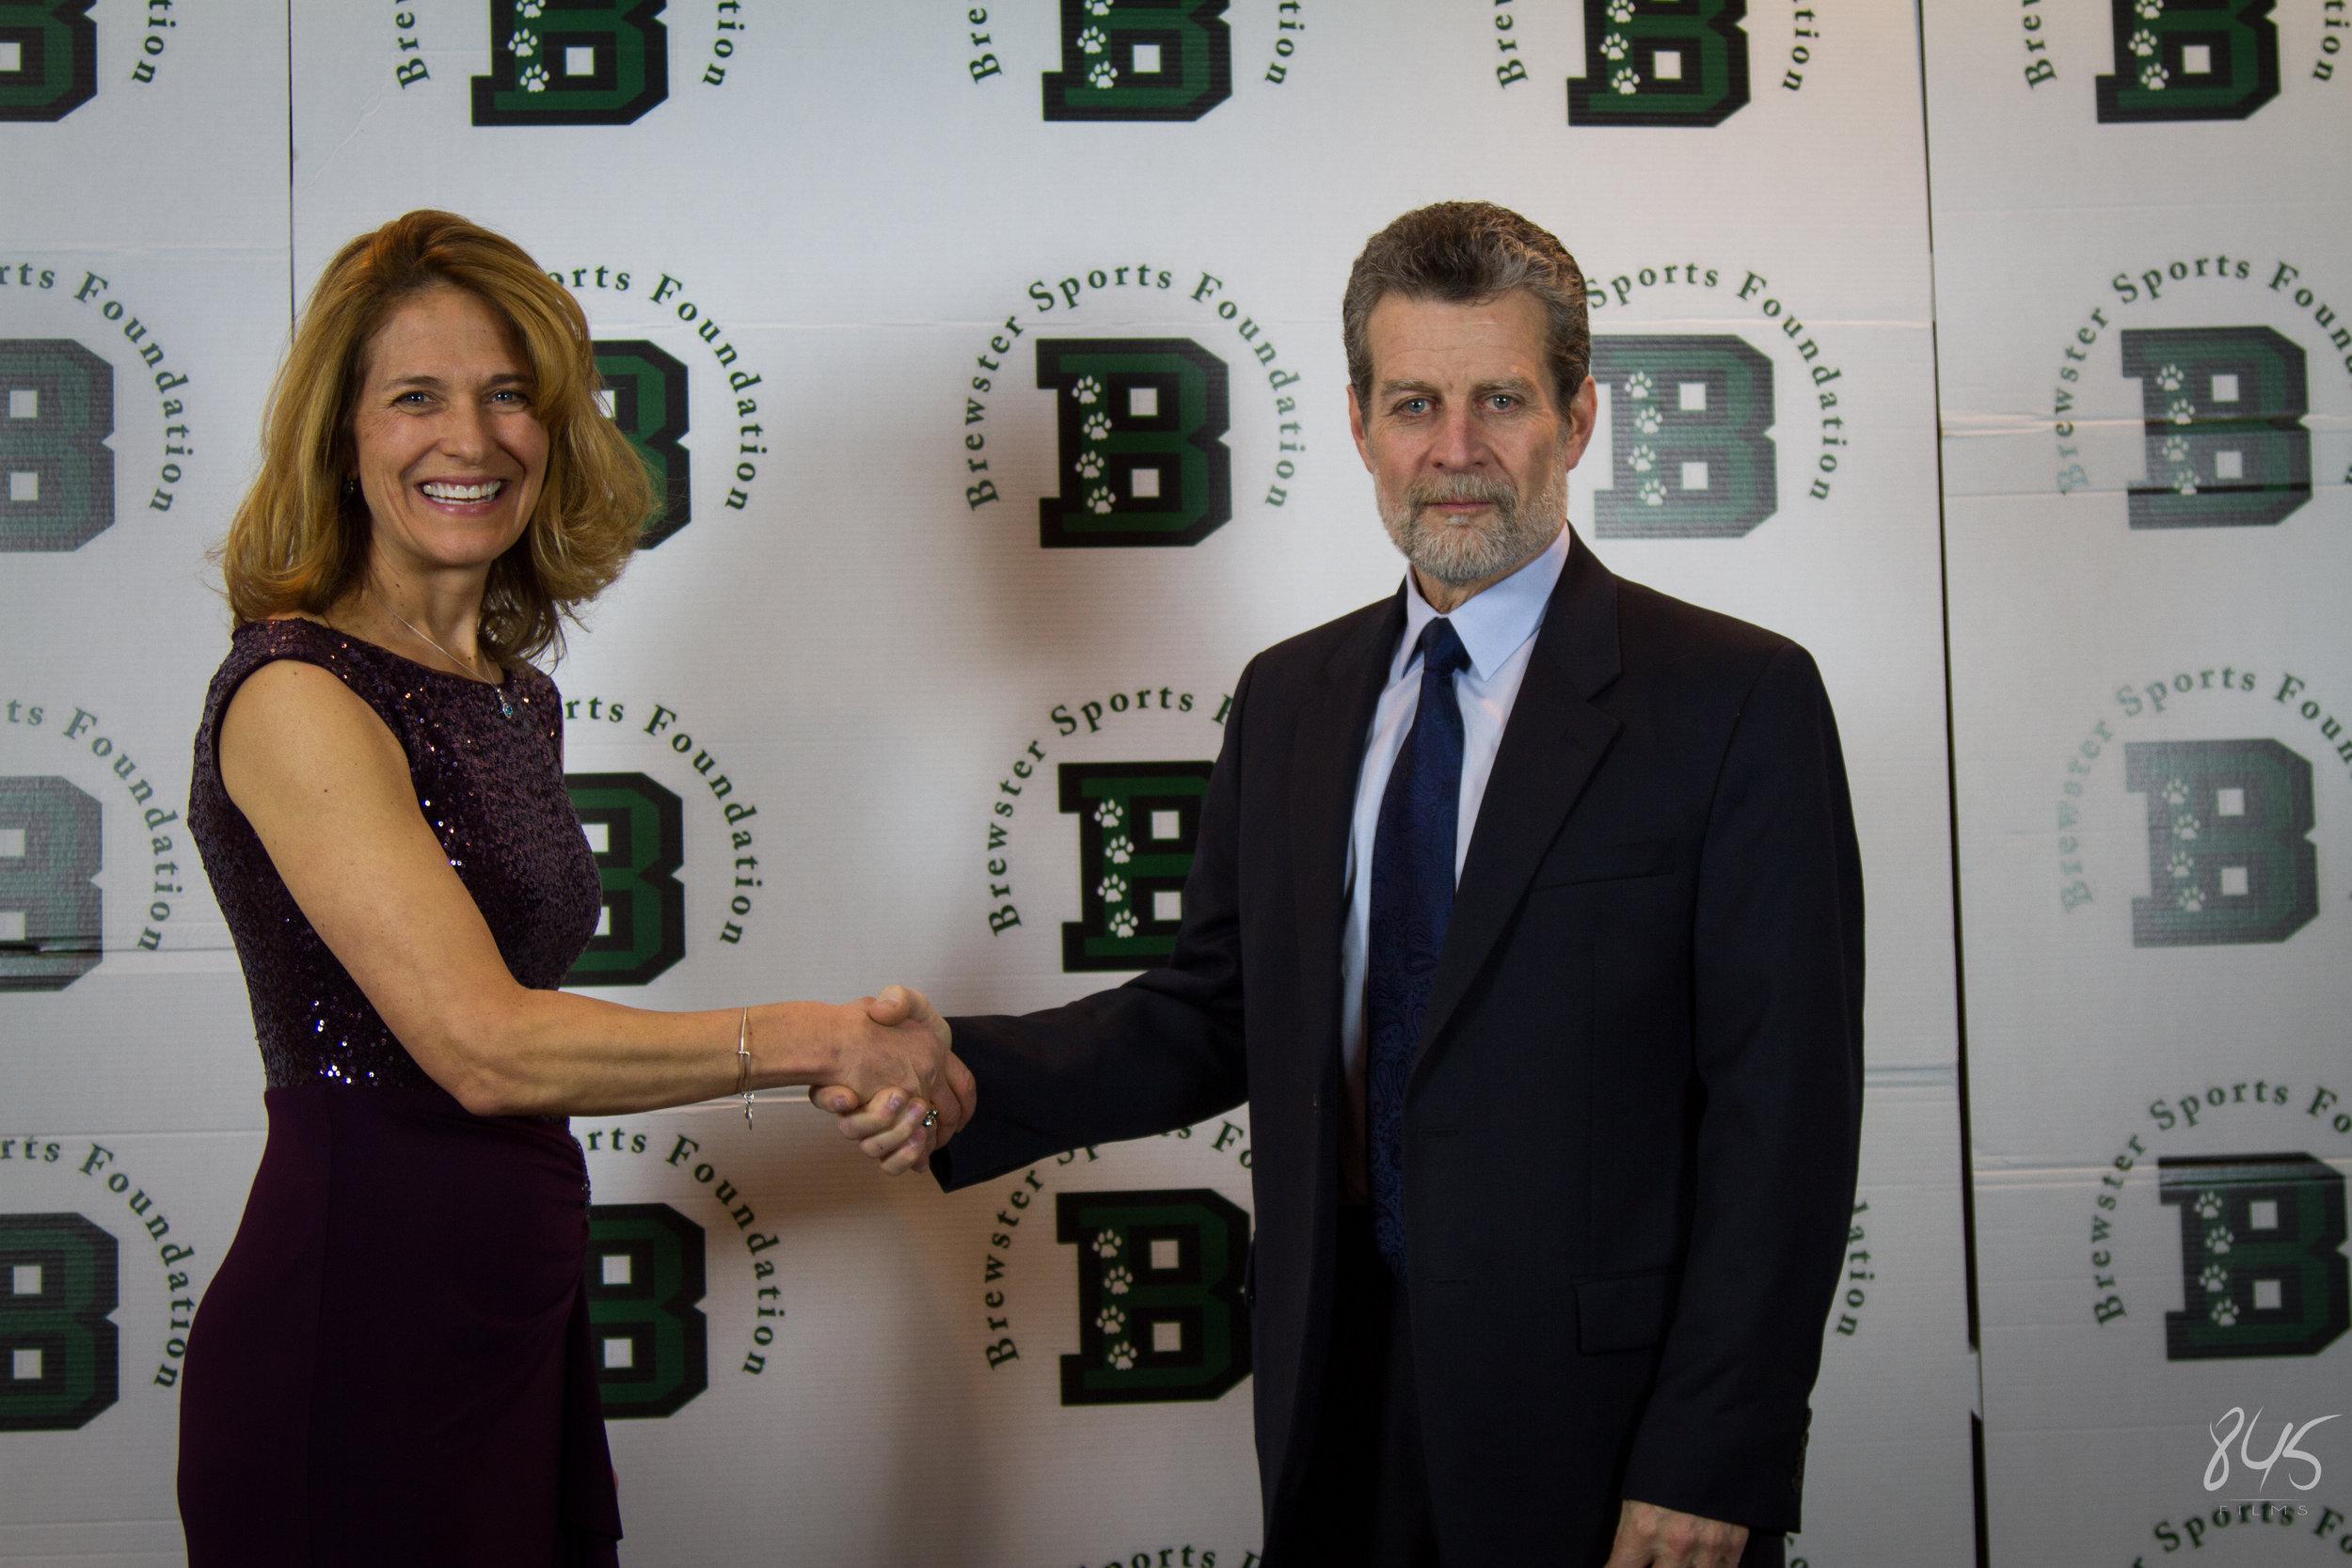 Robin Greene, President, with Dr. Jambor